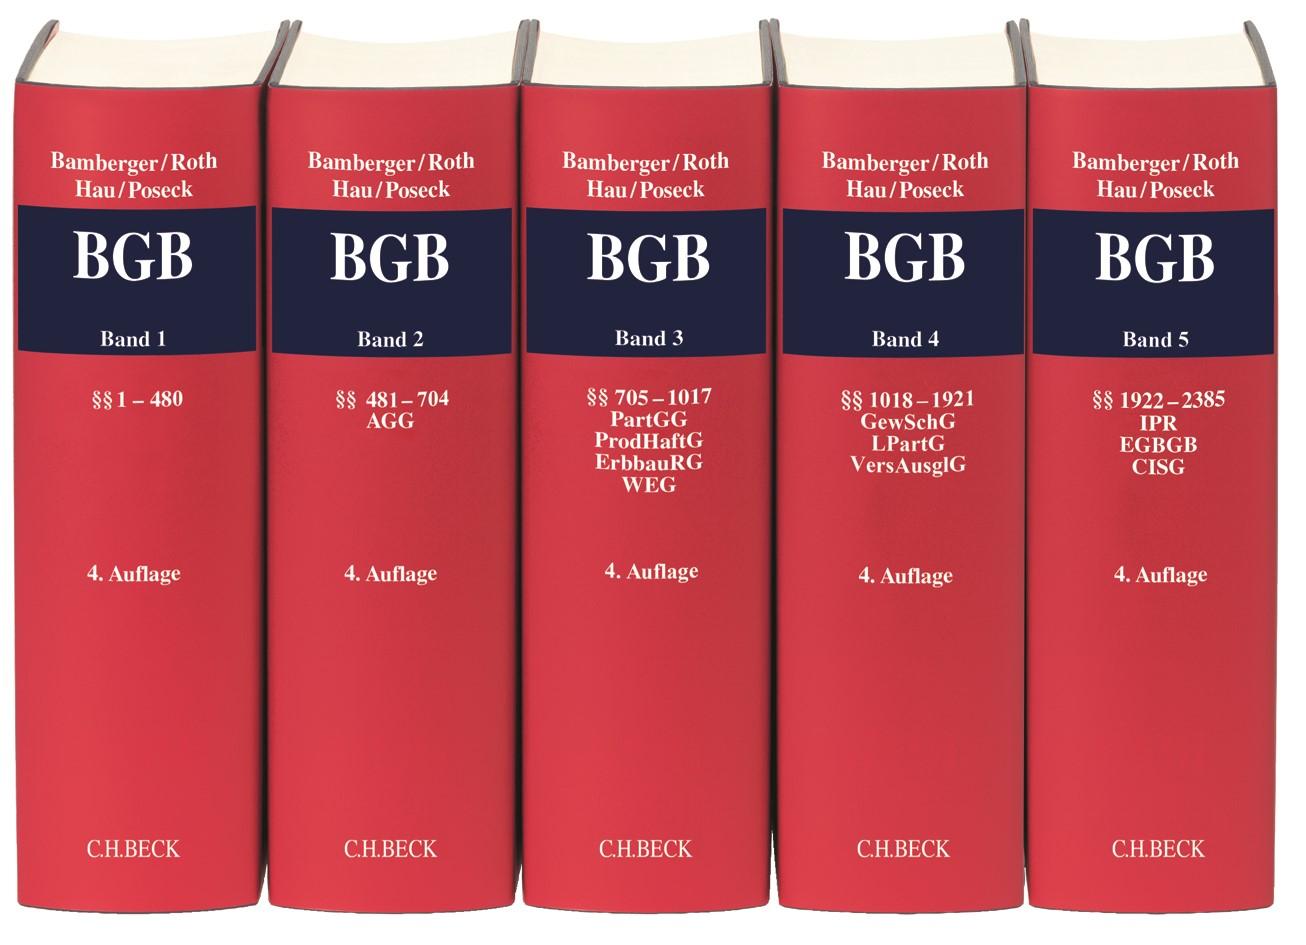 Bürgerliches Gesetzbuch: BGB | Bamberger / Roth / Hau / Poseck | 4. Auflage, 2019 | Buch (Cover)